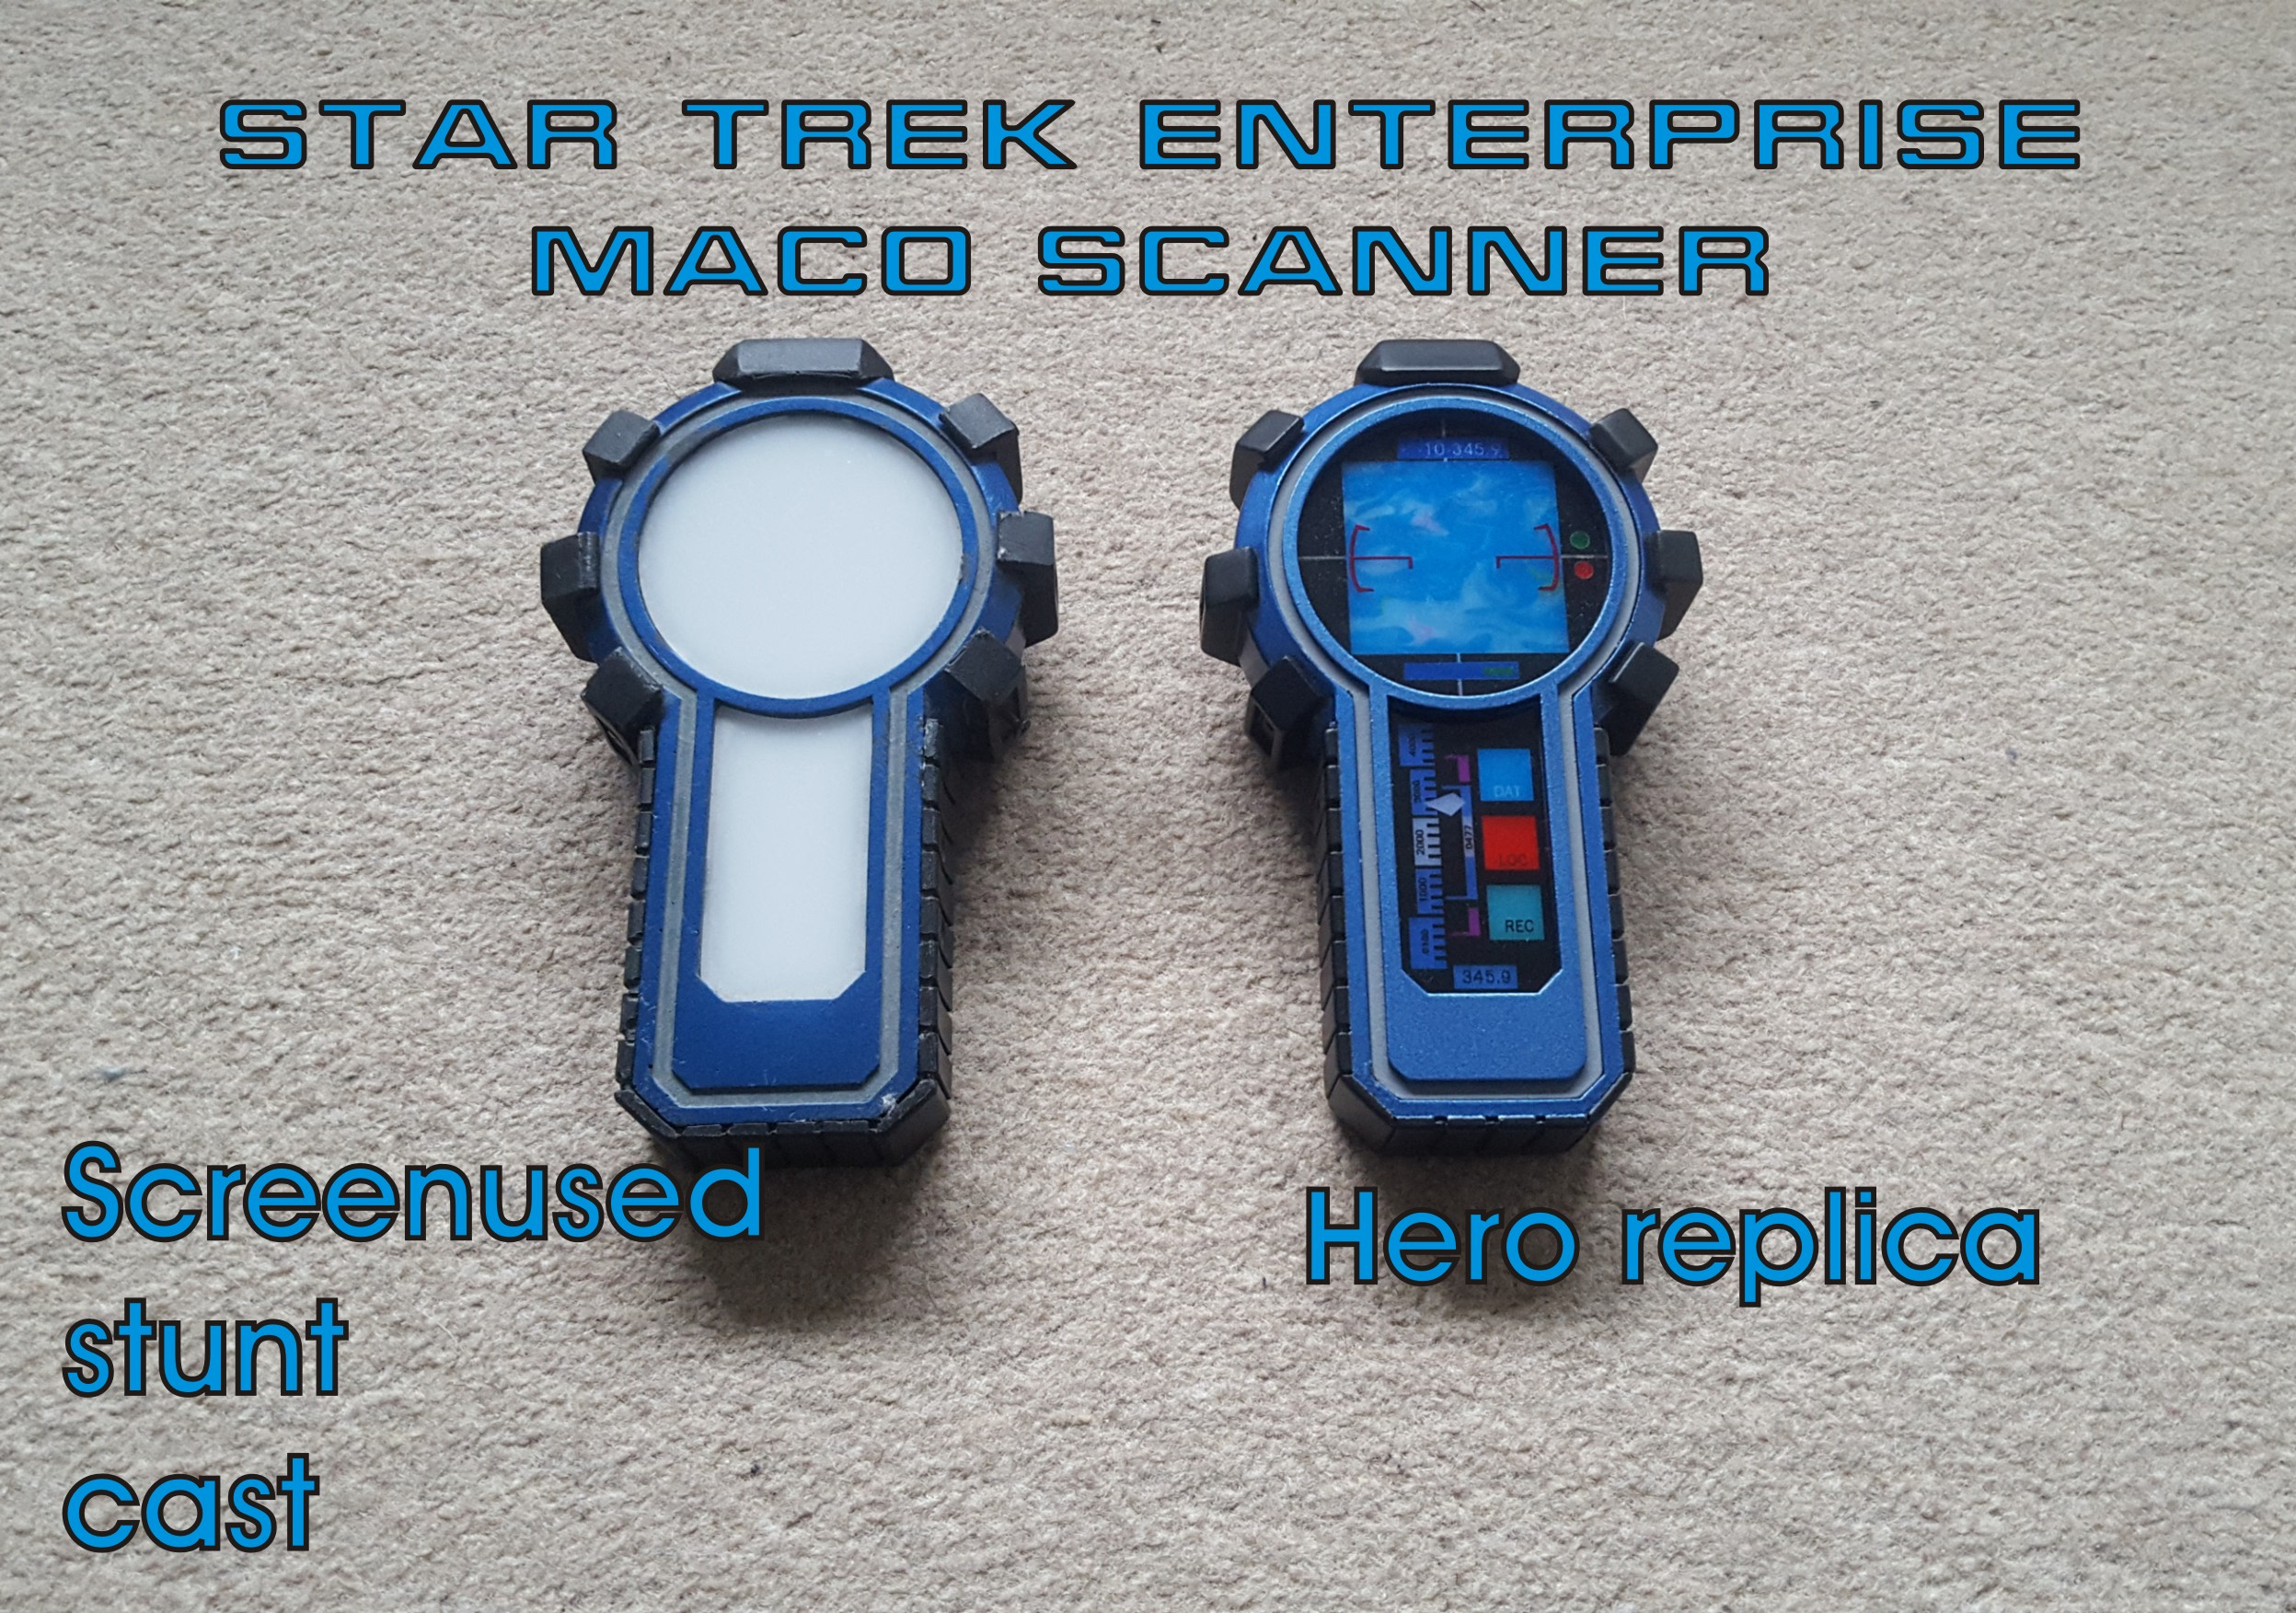 Enterprise Screenused and replica.jpg